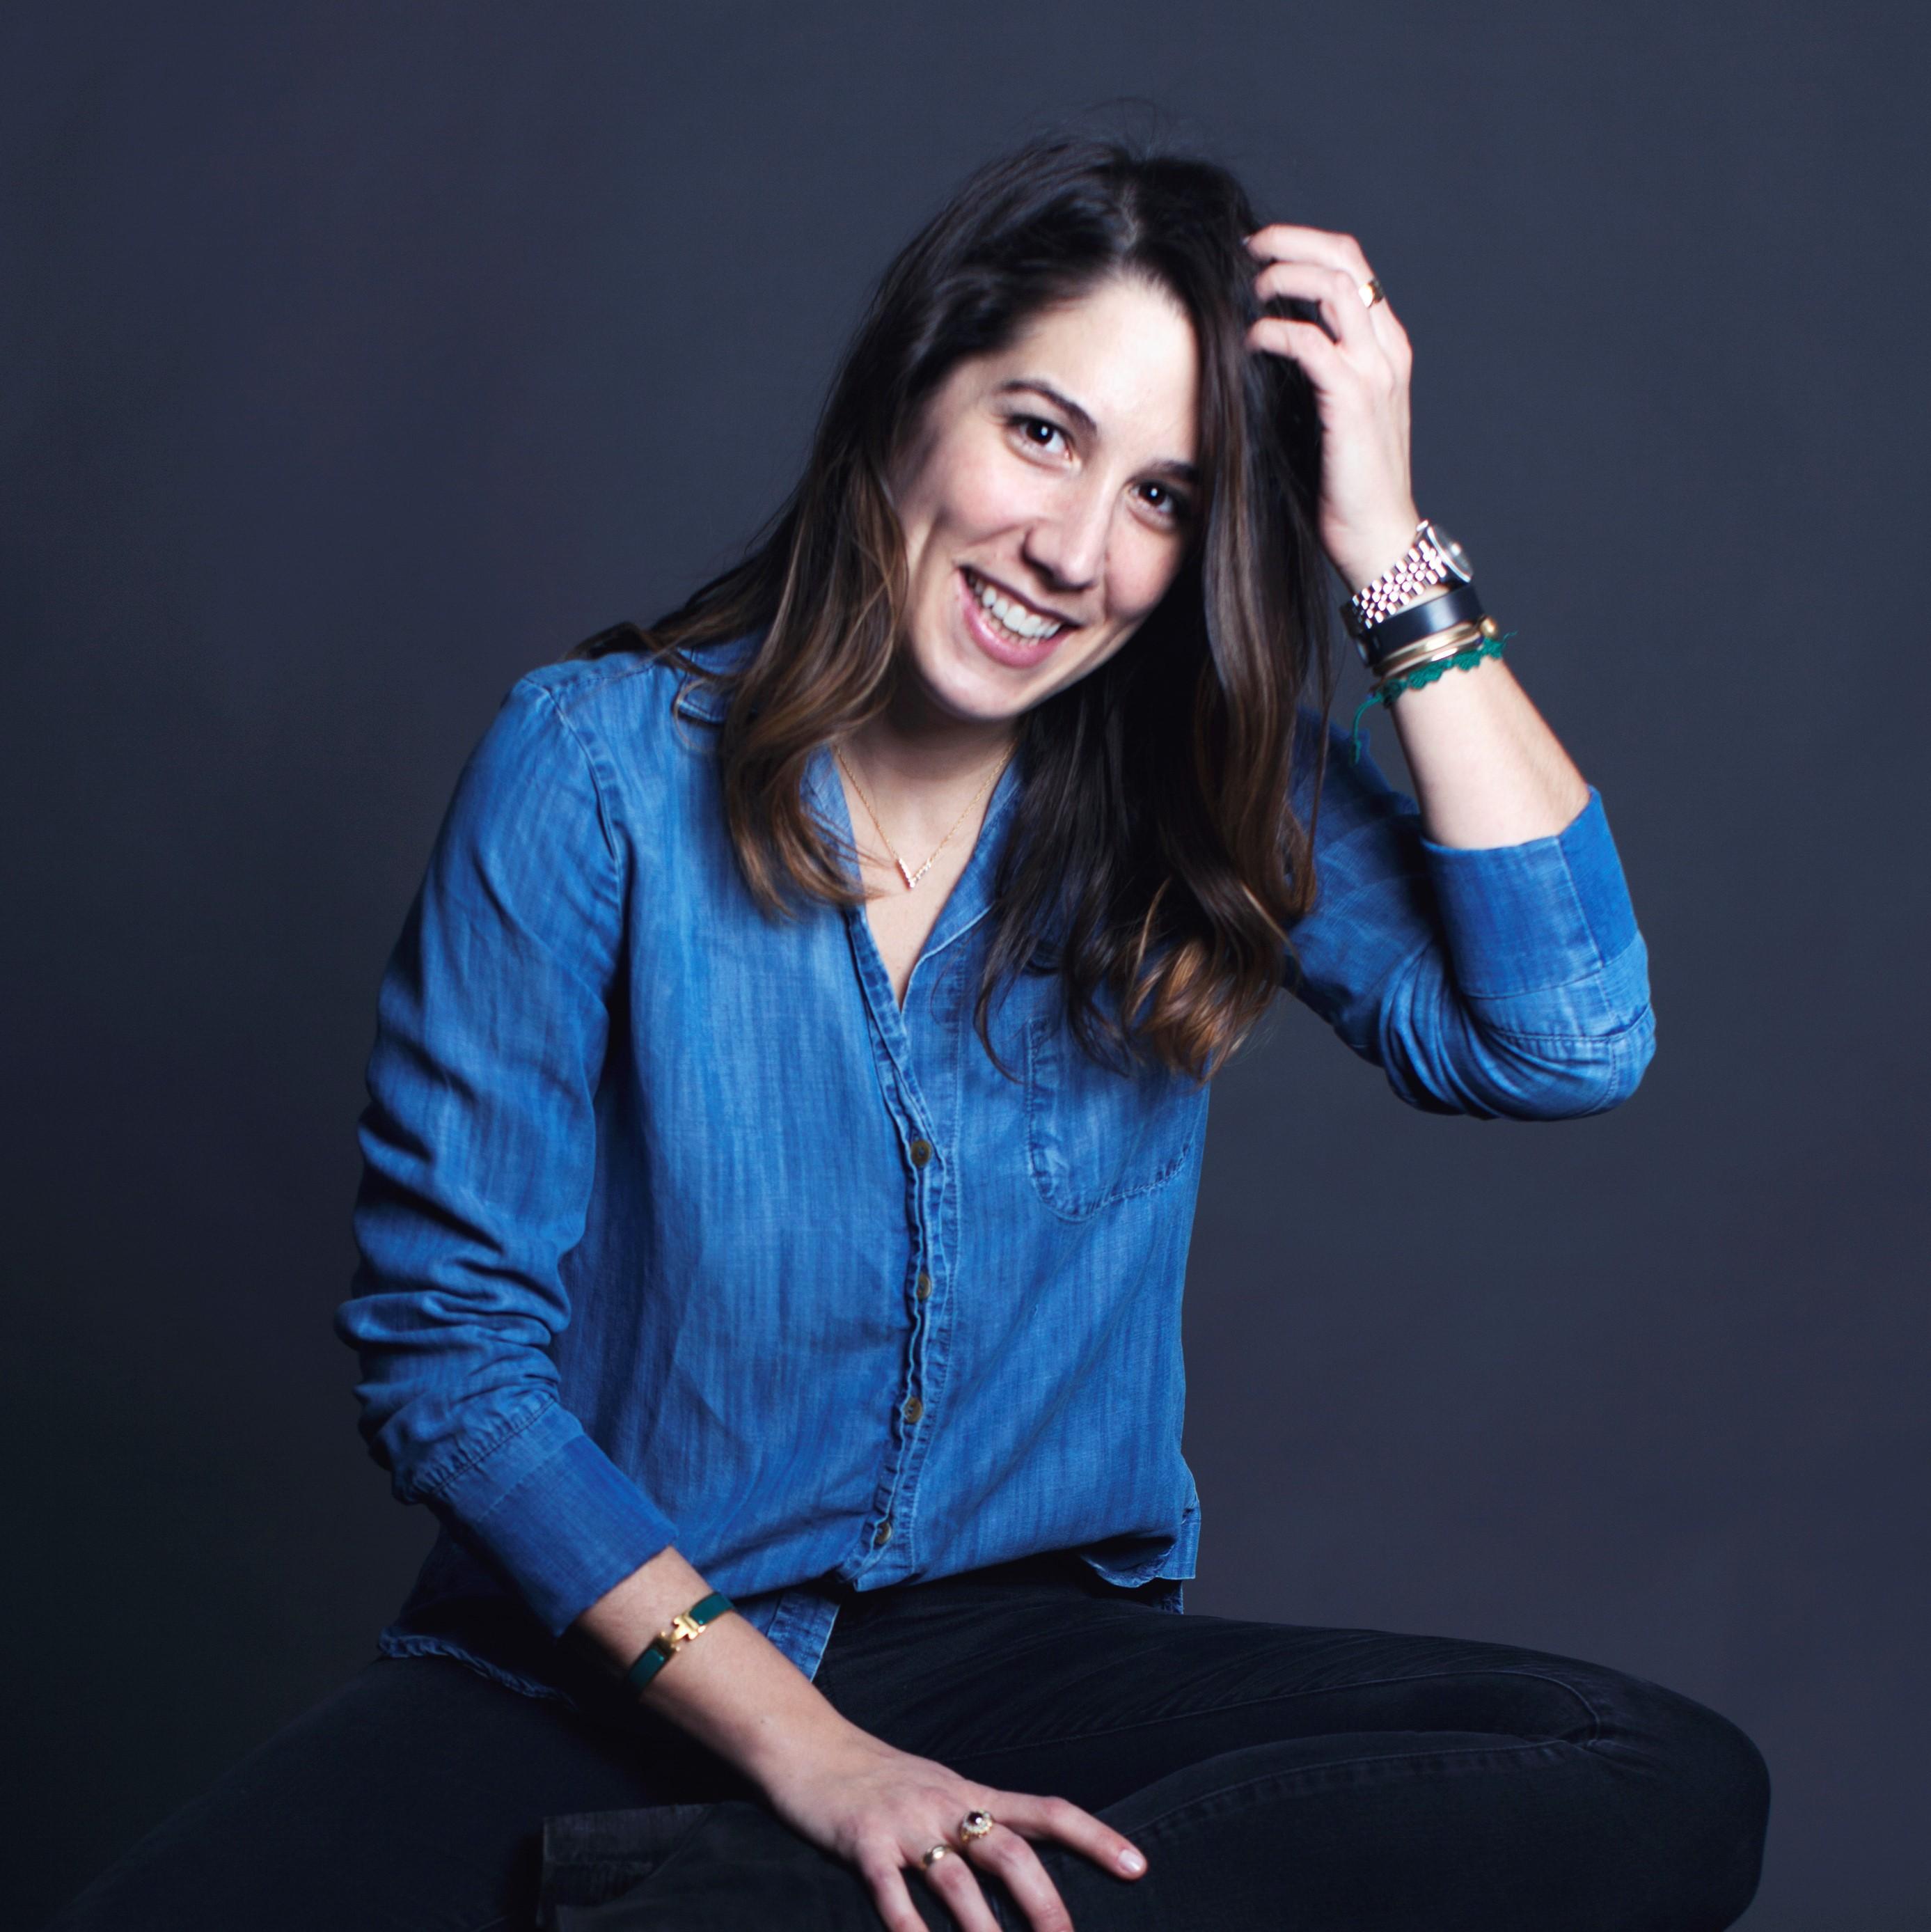 Suzanne Zuppello